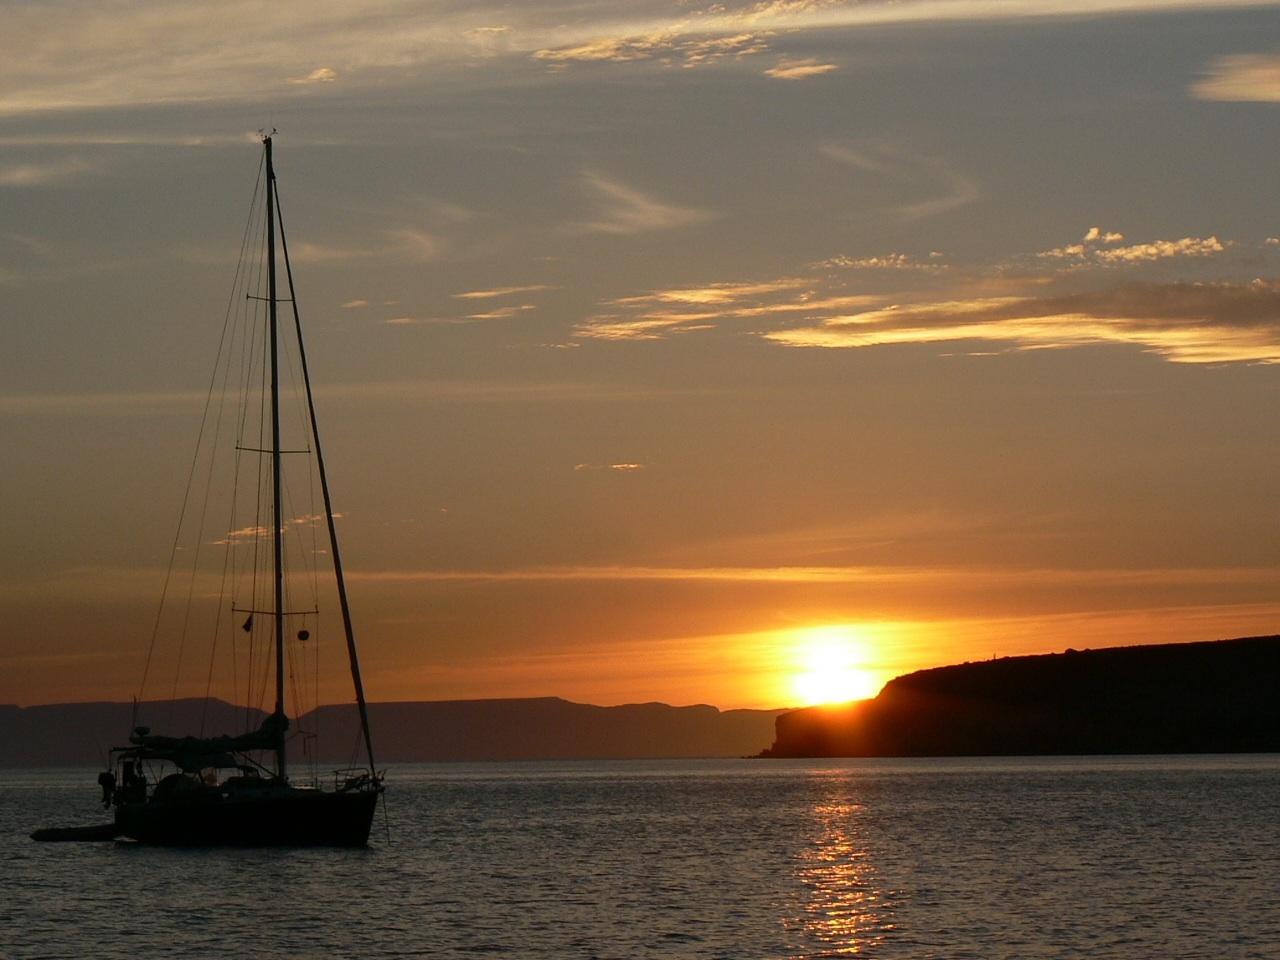 Click image for larger version  Name:Ensenada Grande Sunset.JPG Views:293 Size:317.5 KB ID:133183